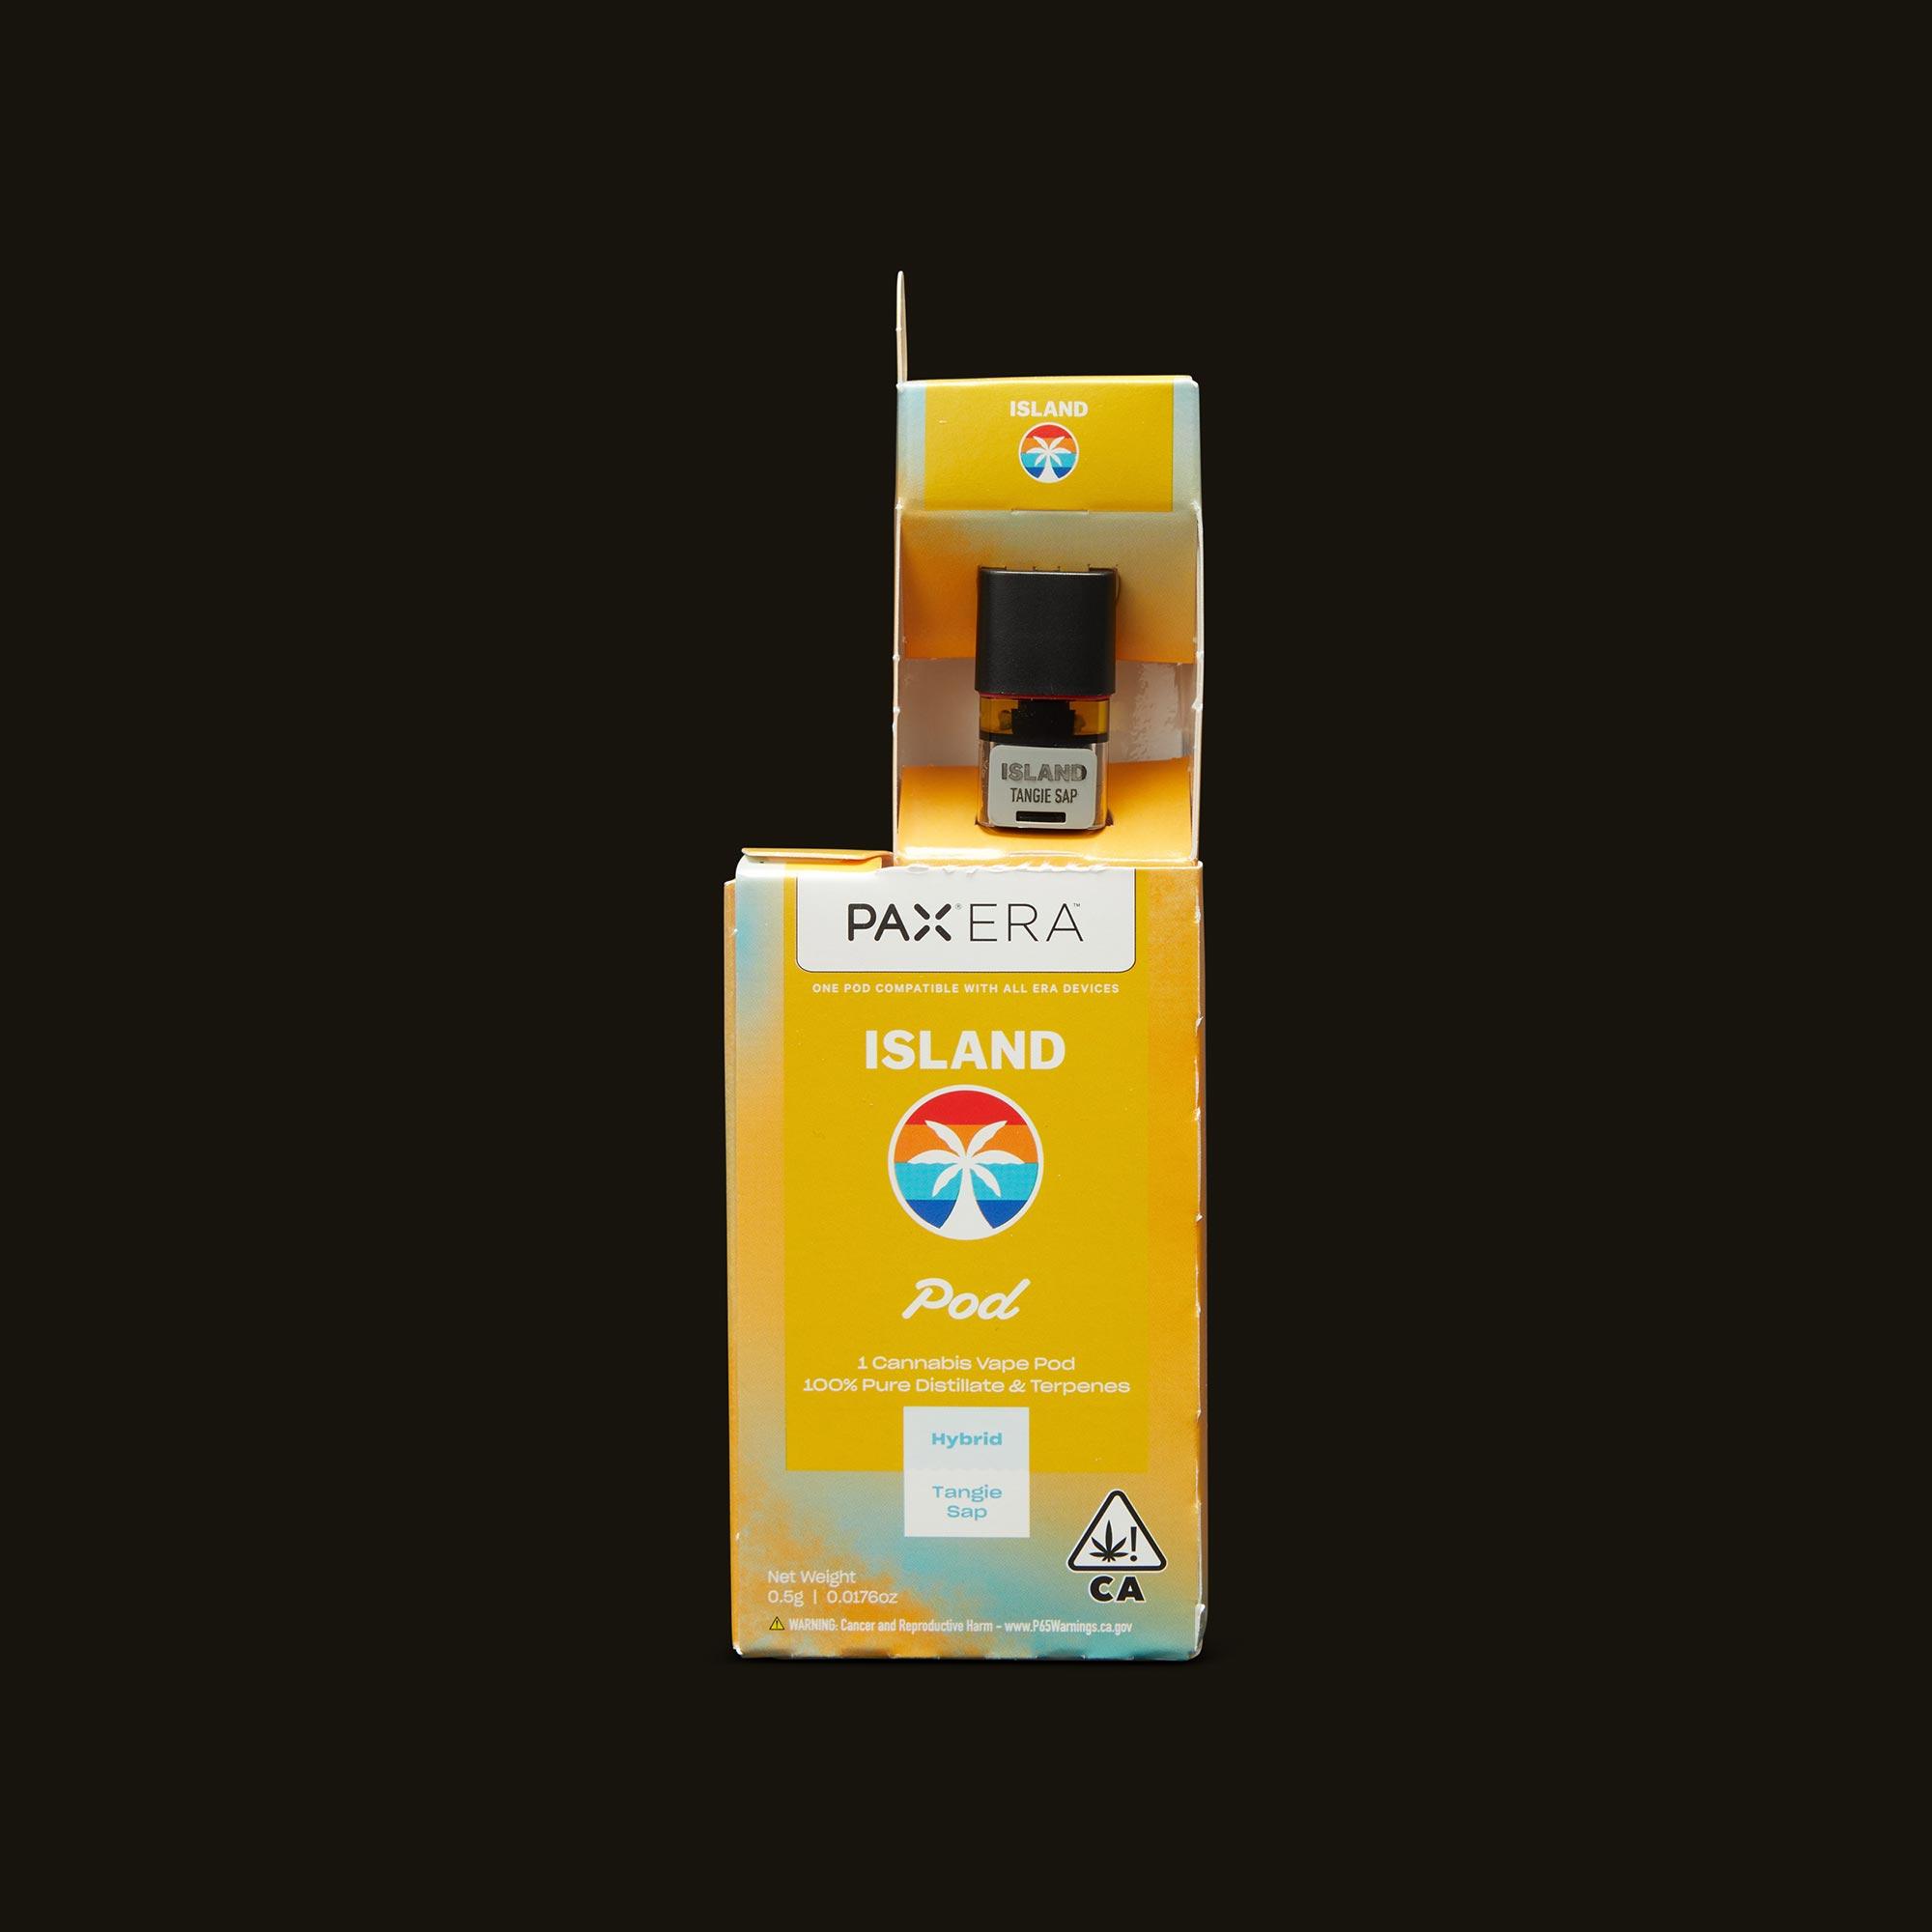 Island Tangie Sap PAX Era Pod Open Packaging